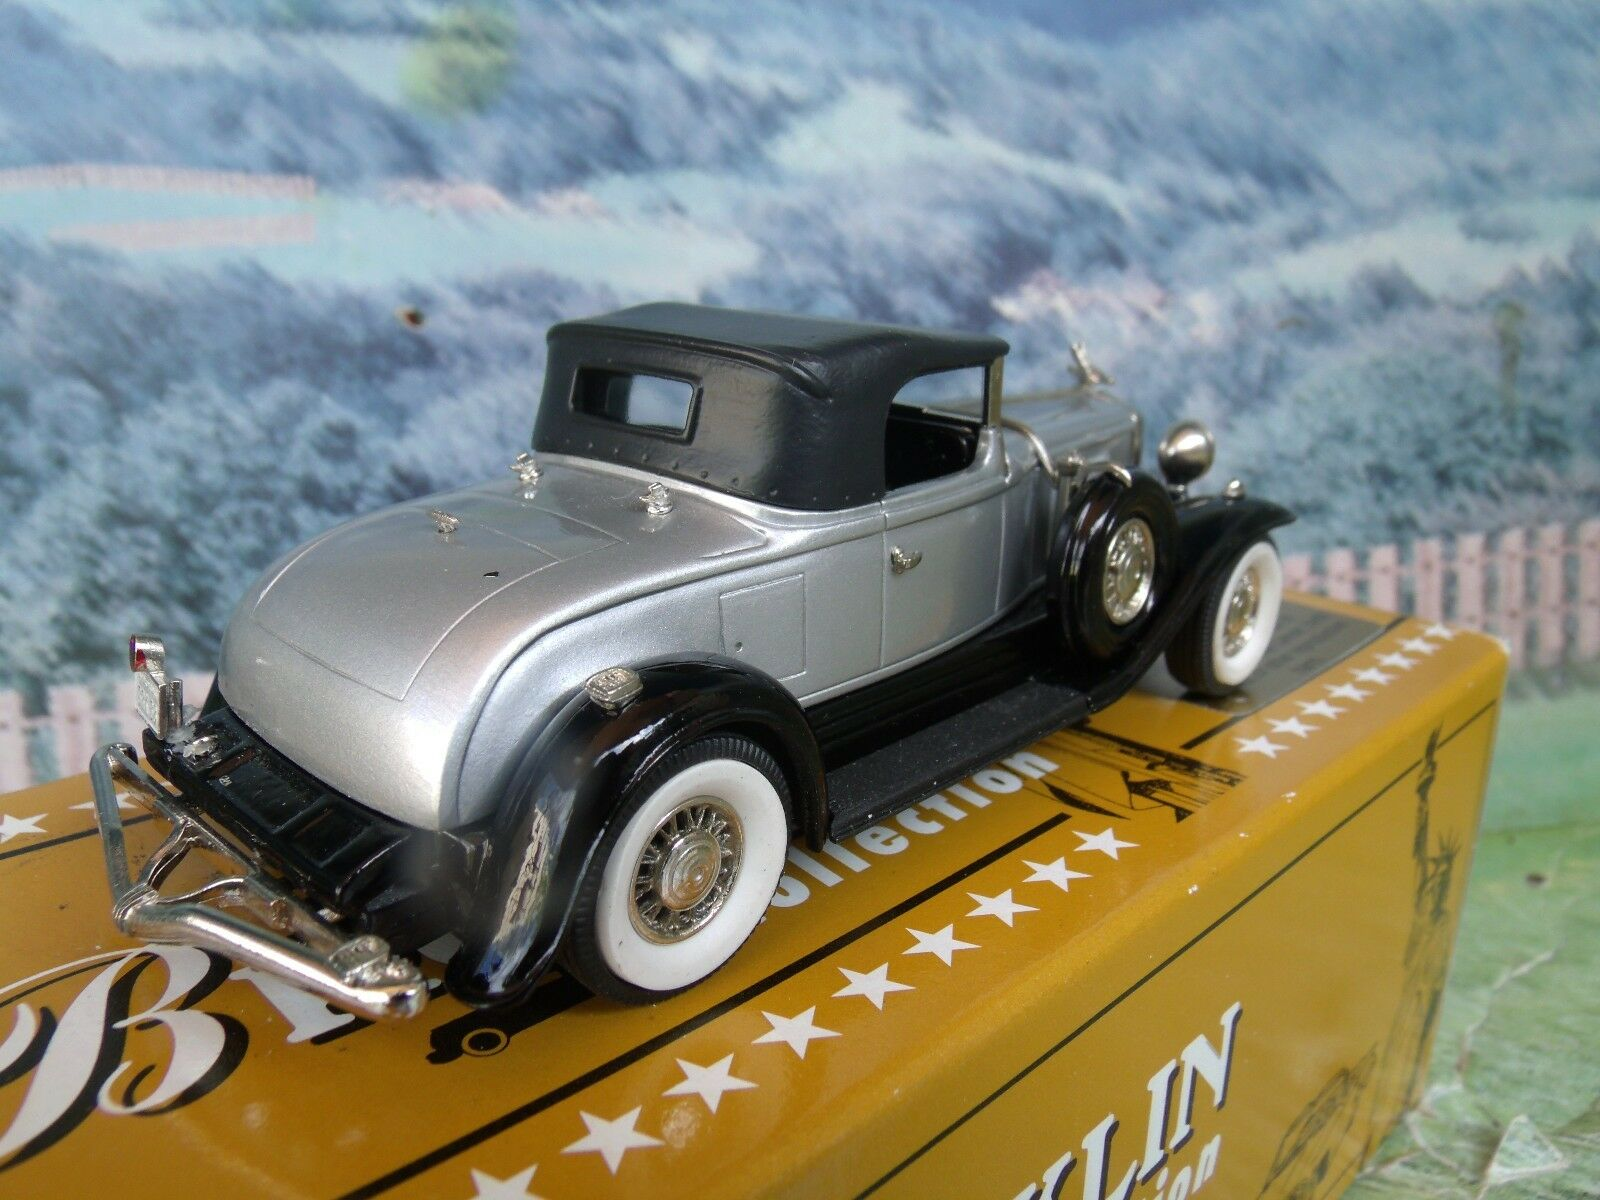 1   43 brooklin modelle modelle modelle (england) 1931 studebaker präsident brk - 88 weißes metall c324a7